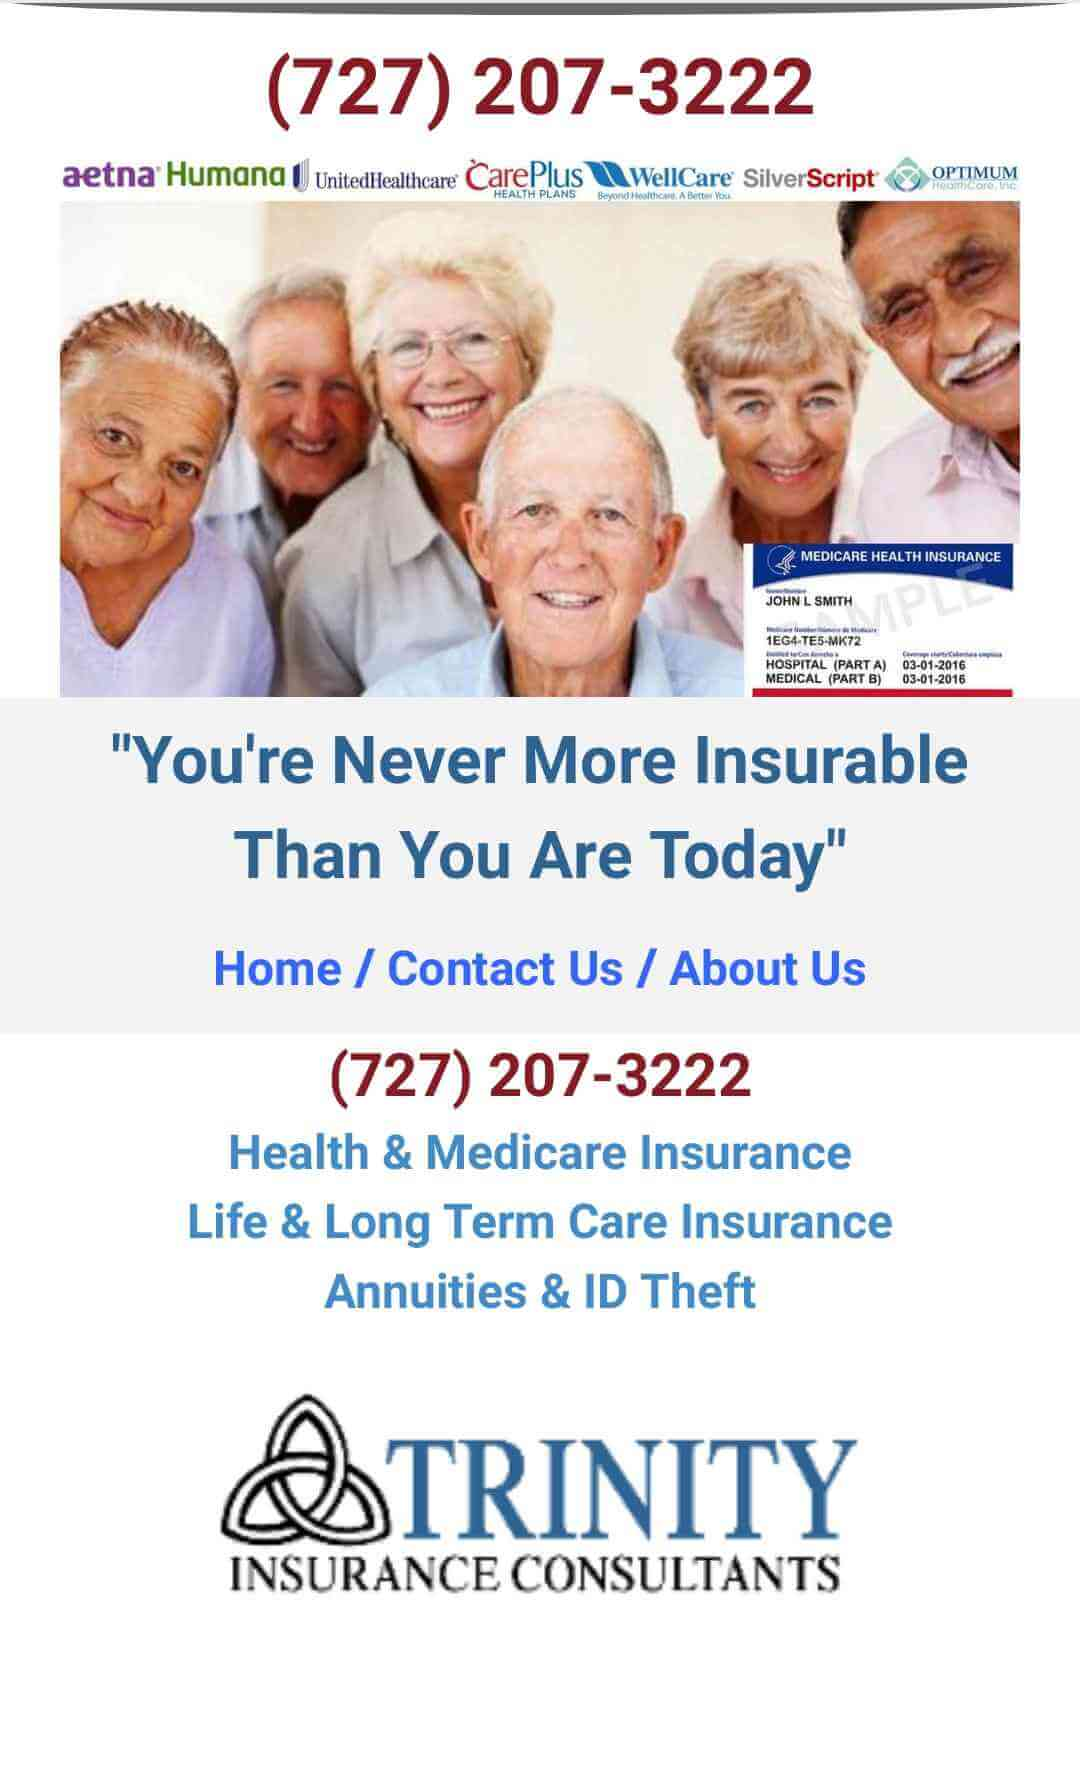 Trinity Insurance Consultants